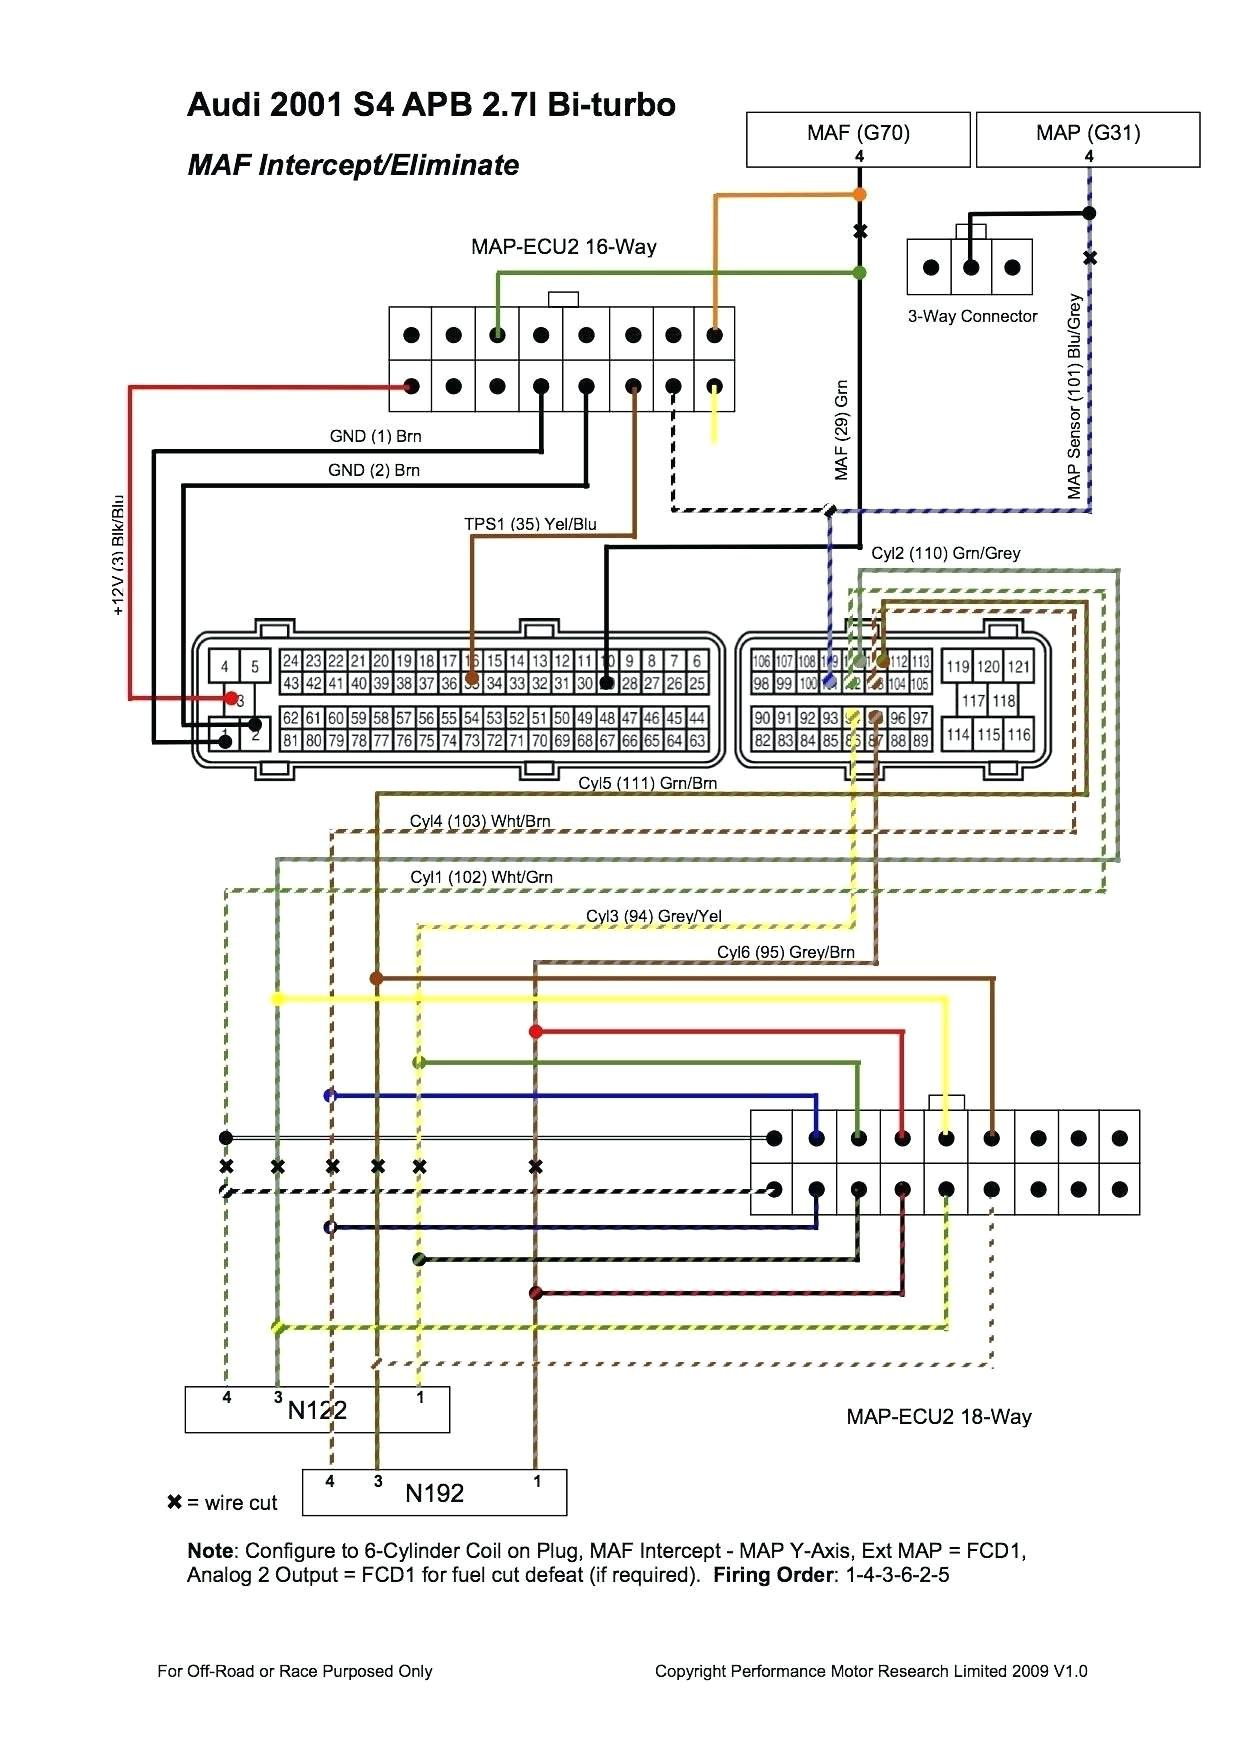 wiring diagram for 1994 dodge ram 1500 wiring diagram used 1994 dodge ram 1500 radio wiring